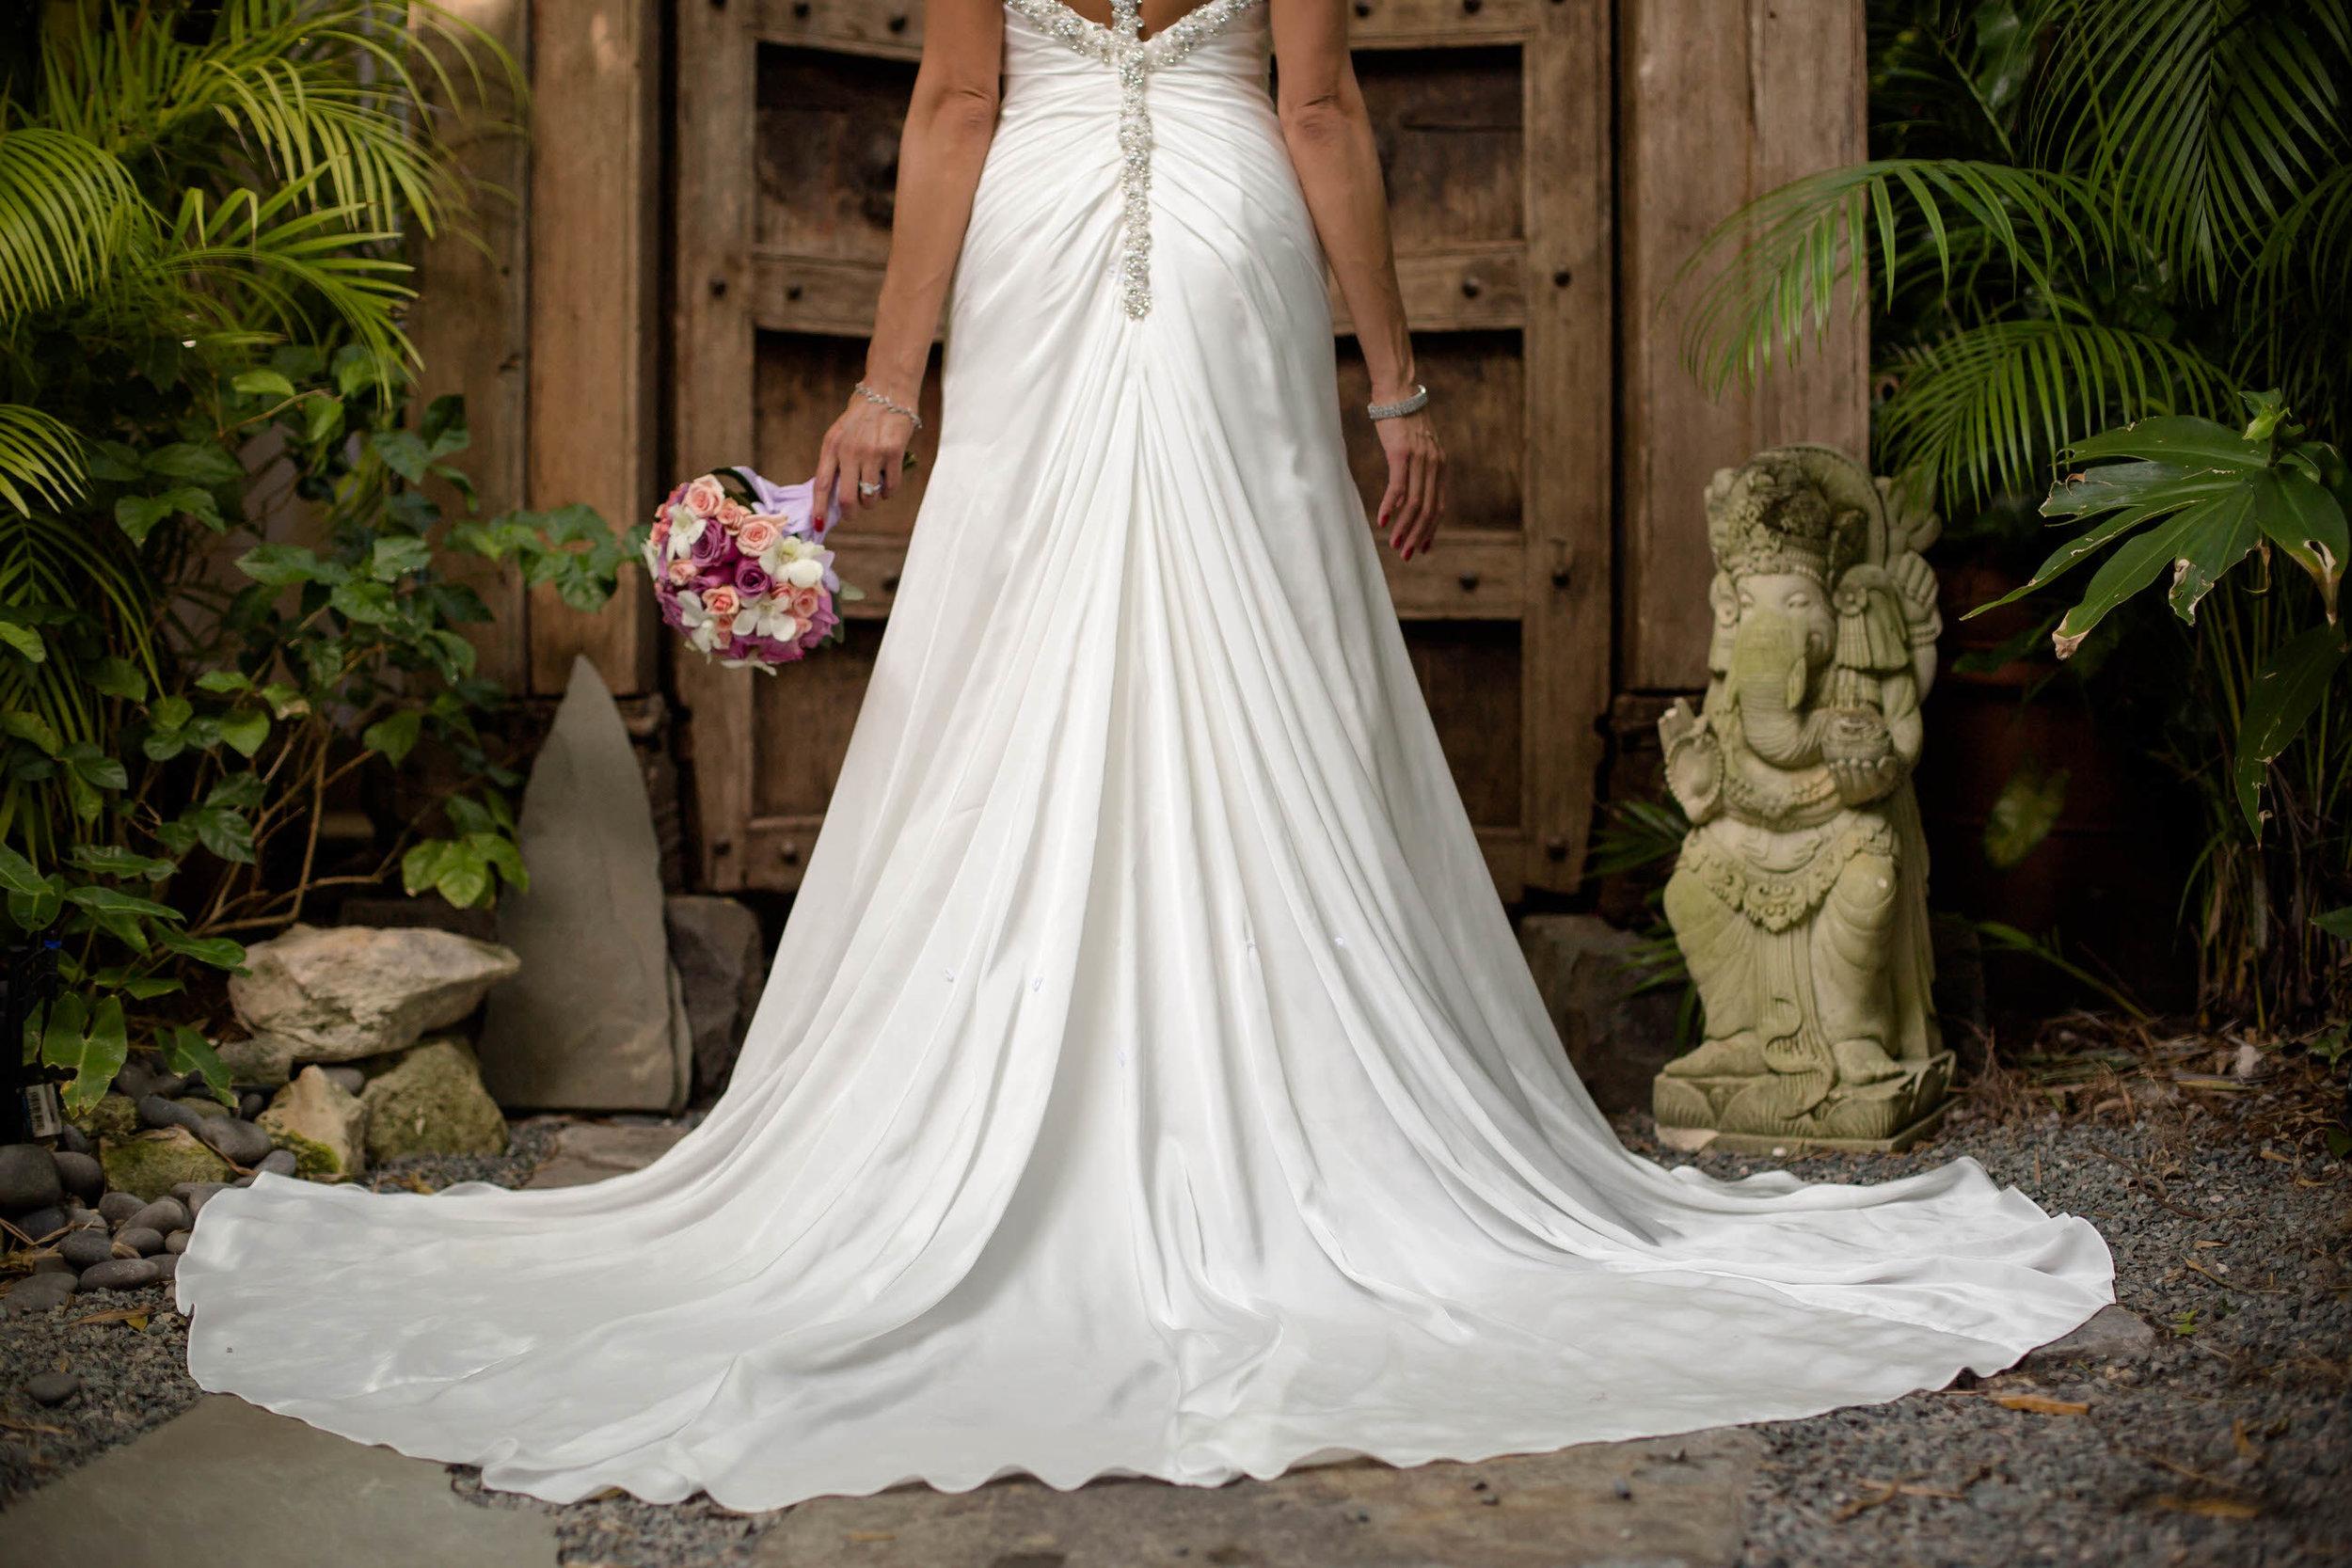 dress_details_tiny_house_photo_florida_keys_wedding.jpg